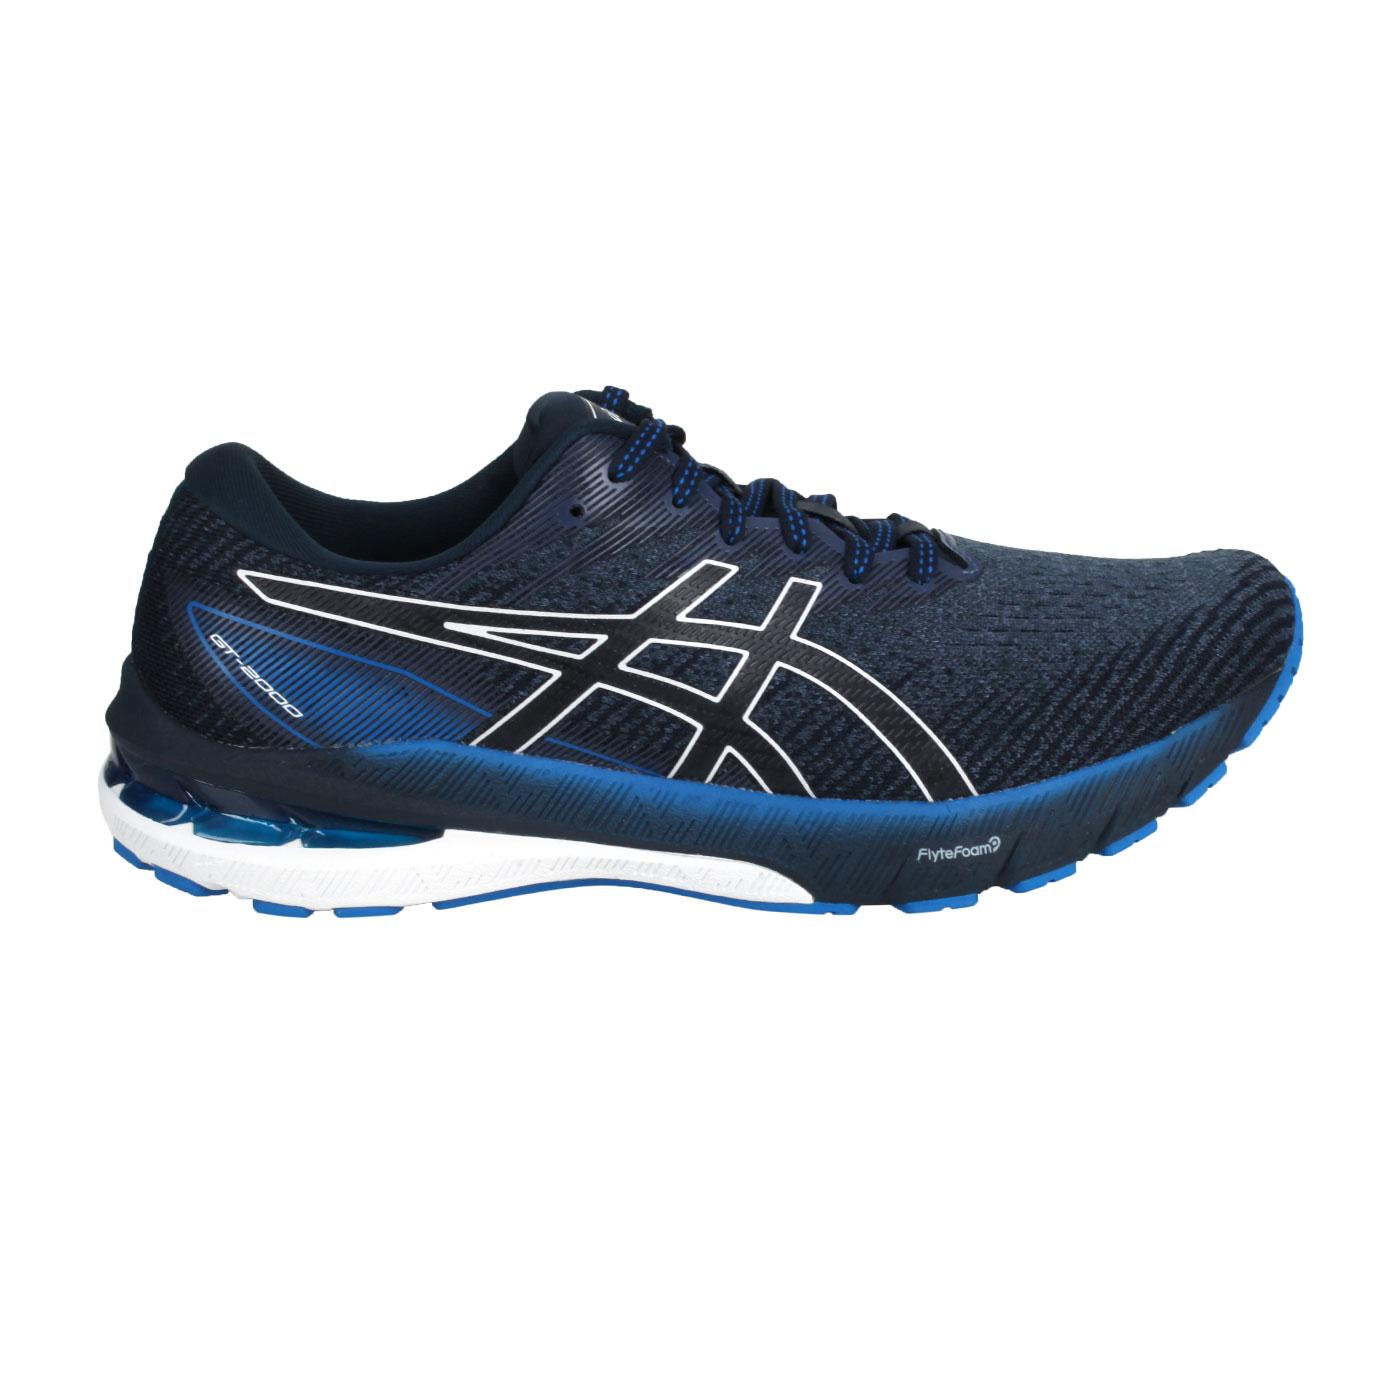 ASICS 男款慢跑鞋  @GT-2000 10@1011B185-400 - 黑藍白